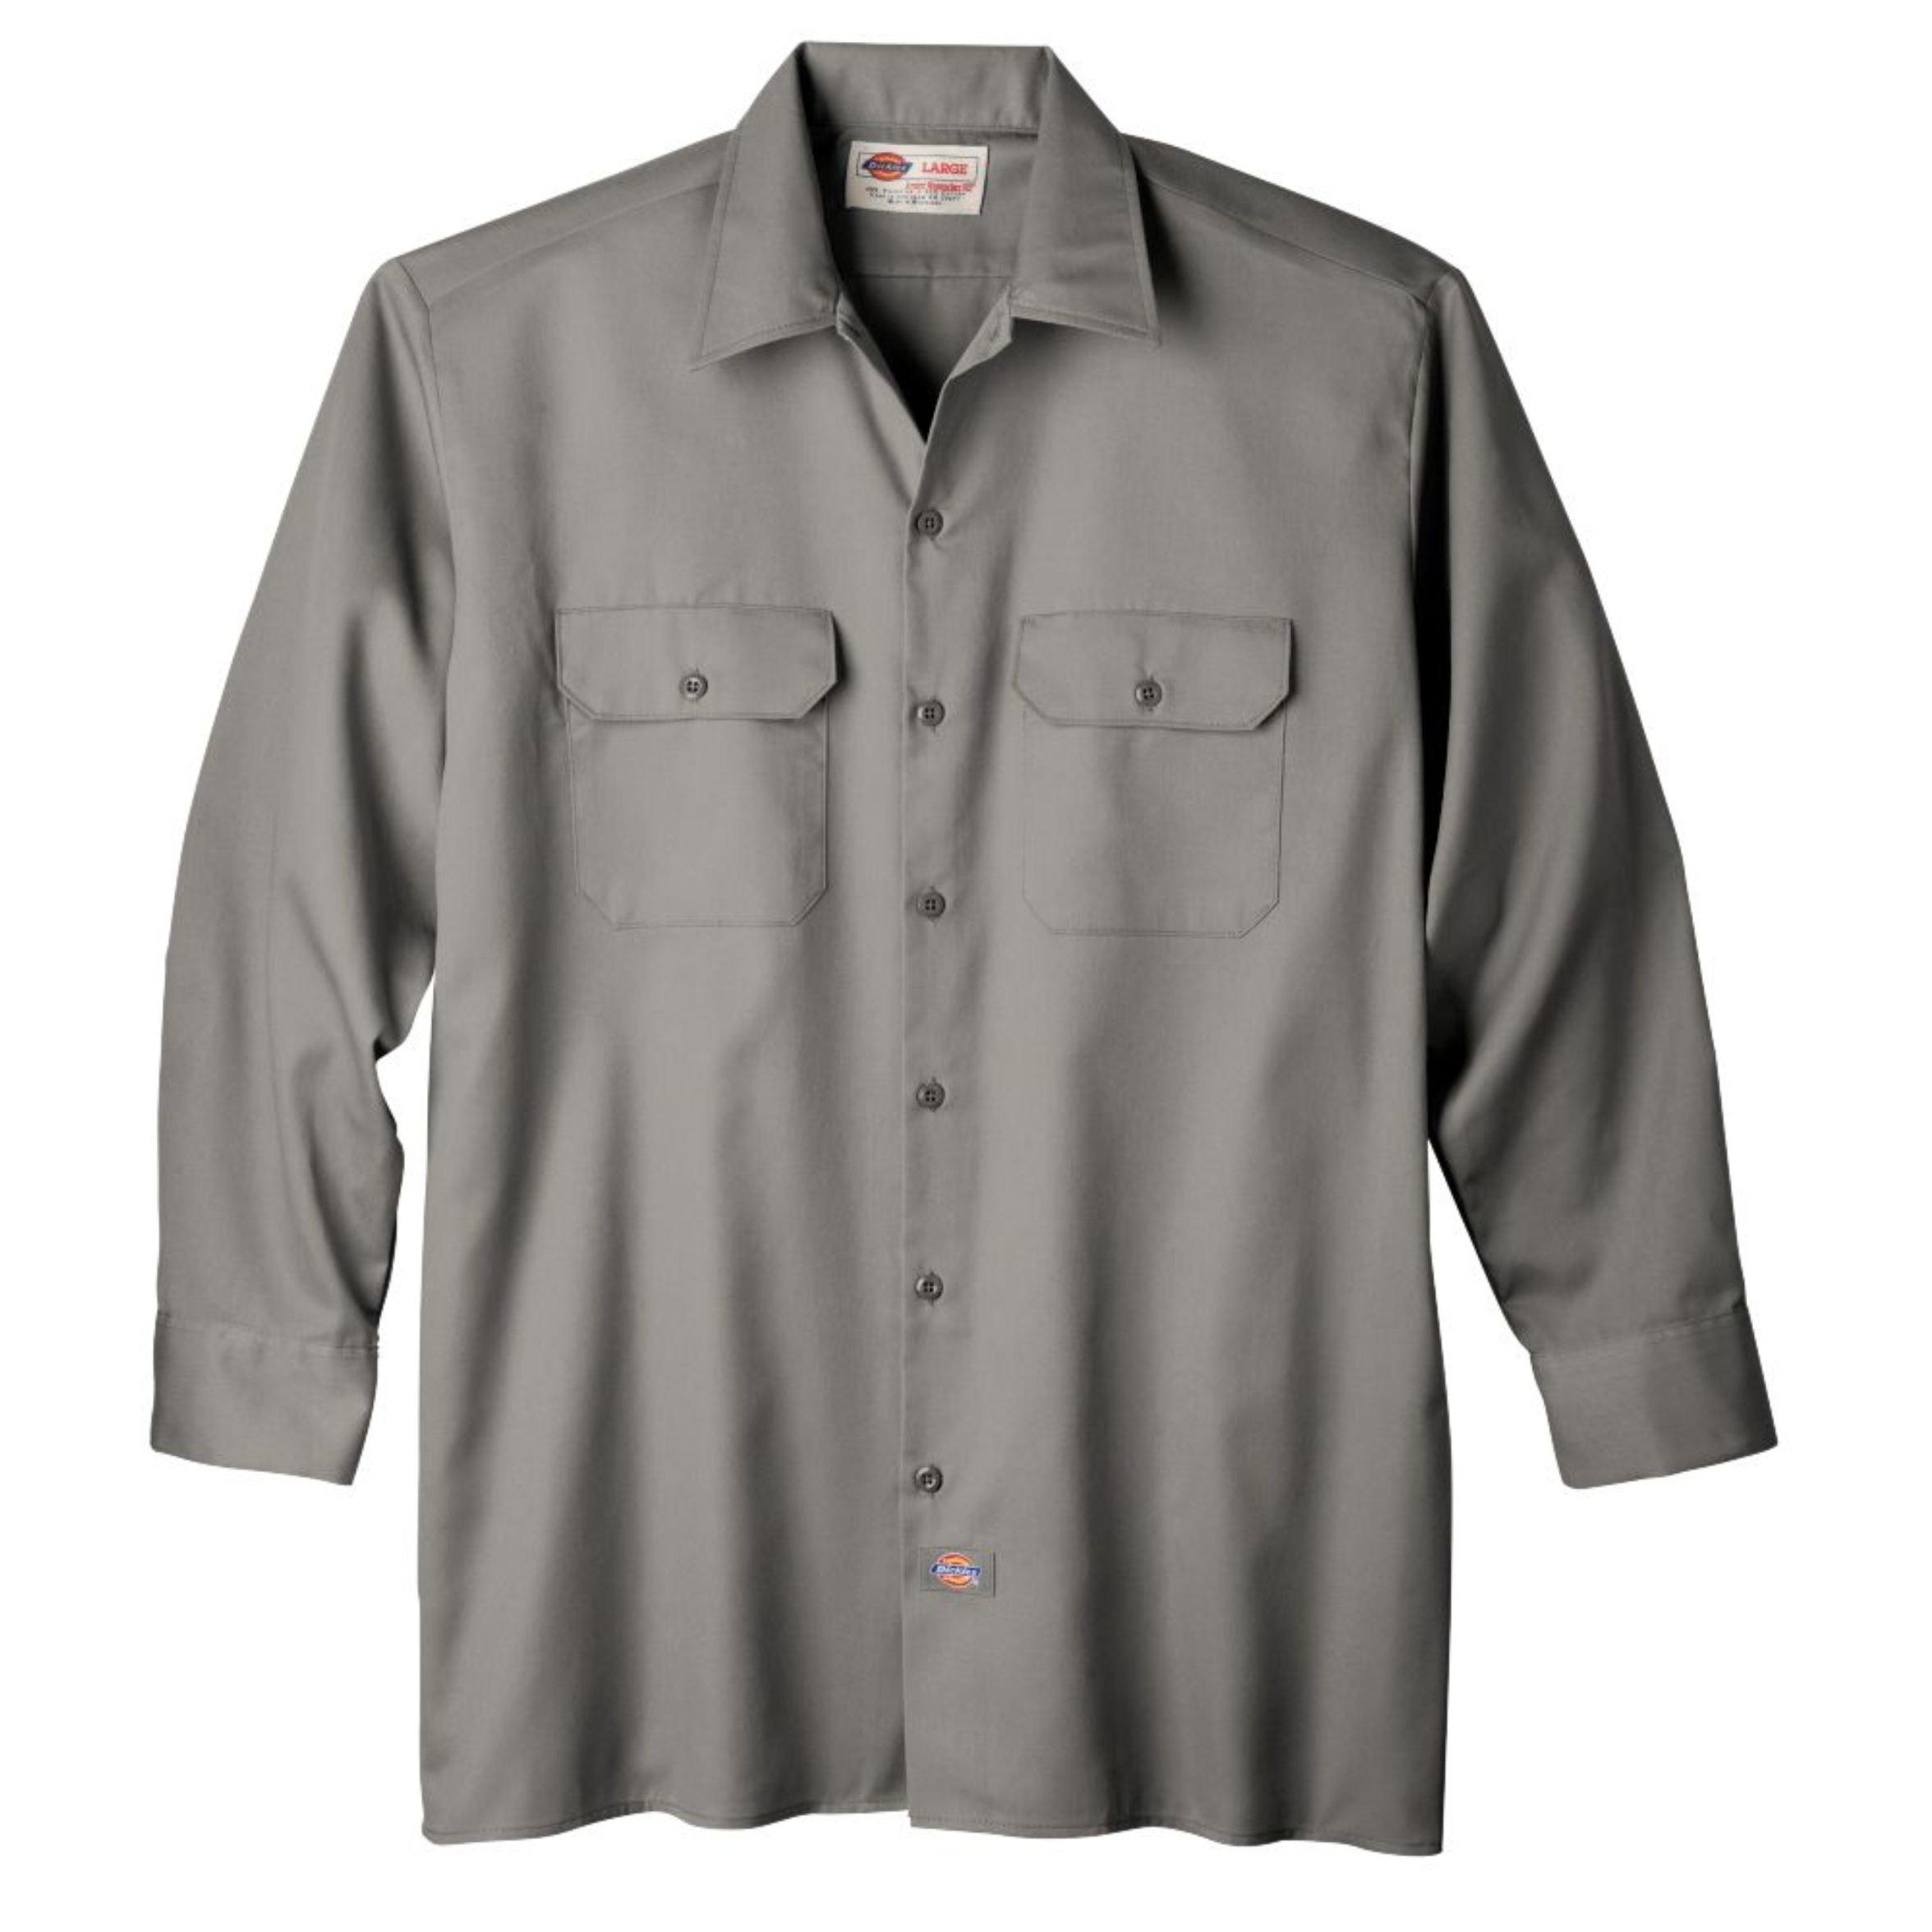 Dickies Men's Long Sleeve Work Shirt, Silver, Small